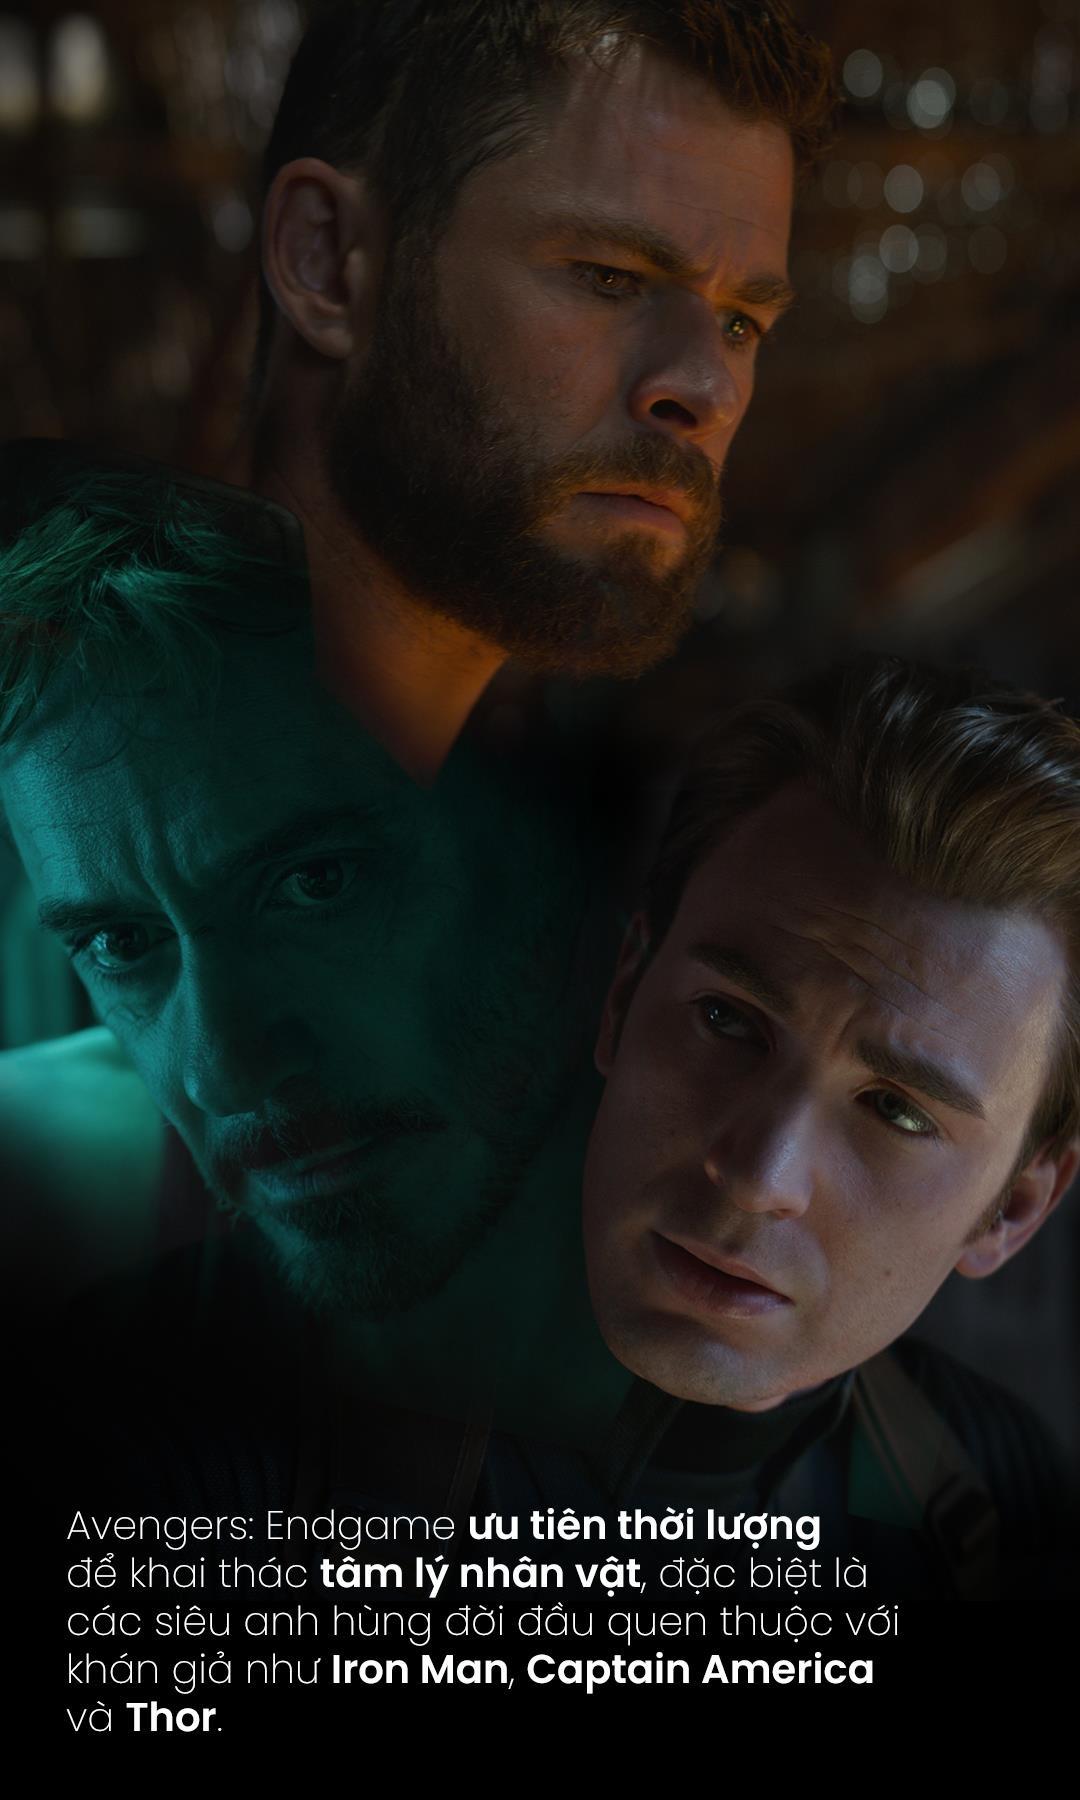 'Avengers: Endgame' - loi tam biet bi trang cua mot ky nguyen anh hung hinh anh 9